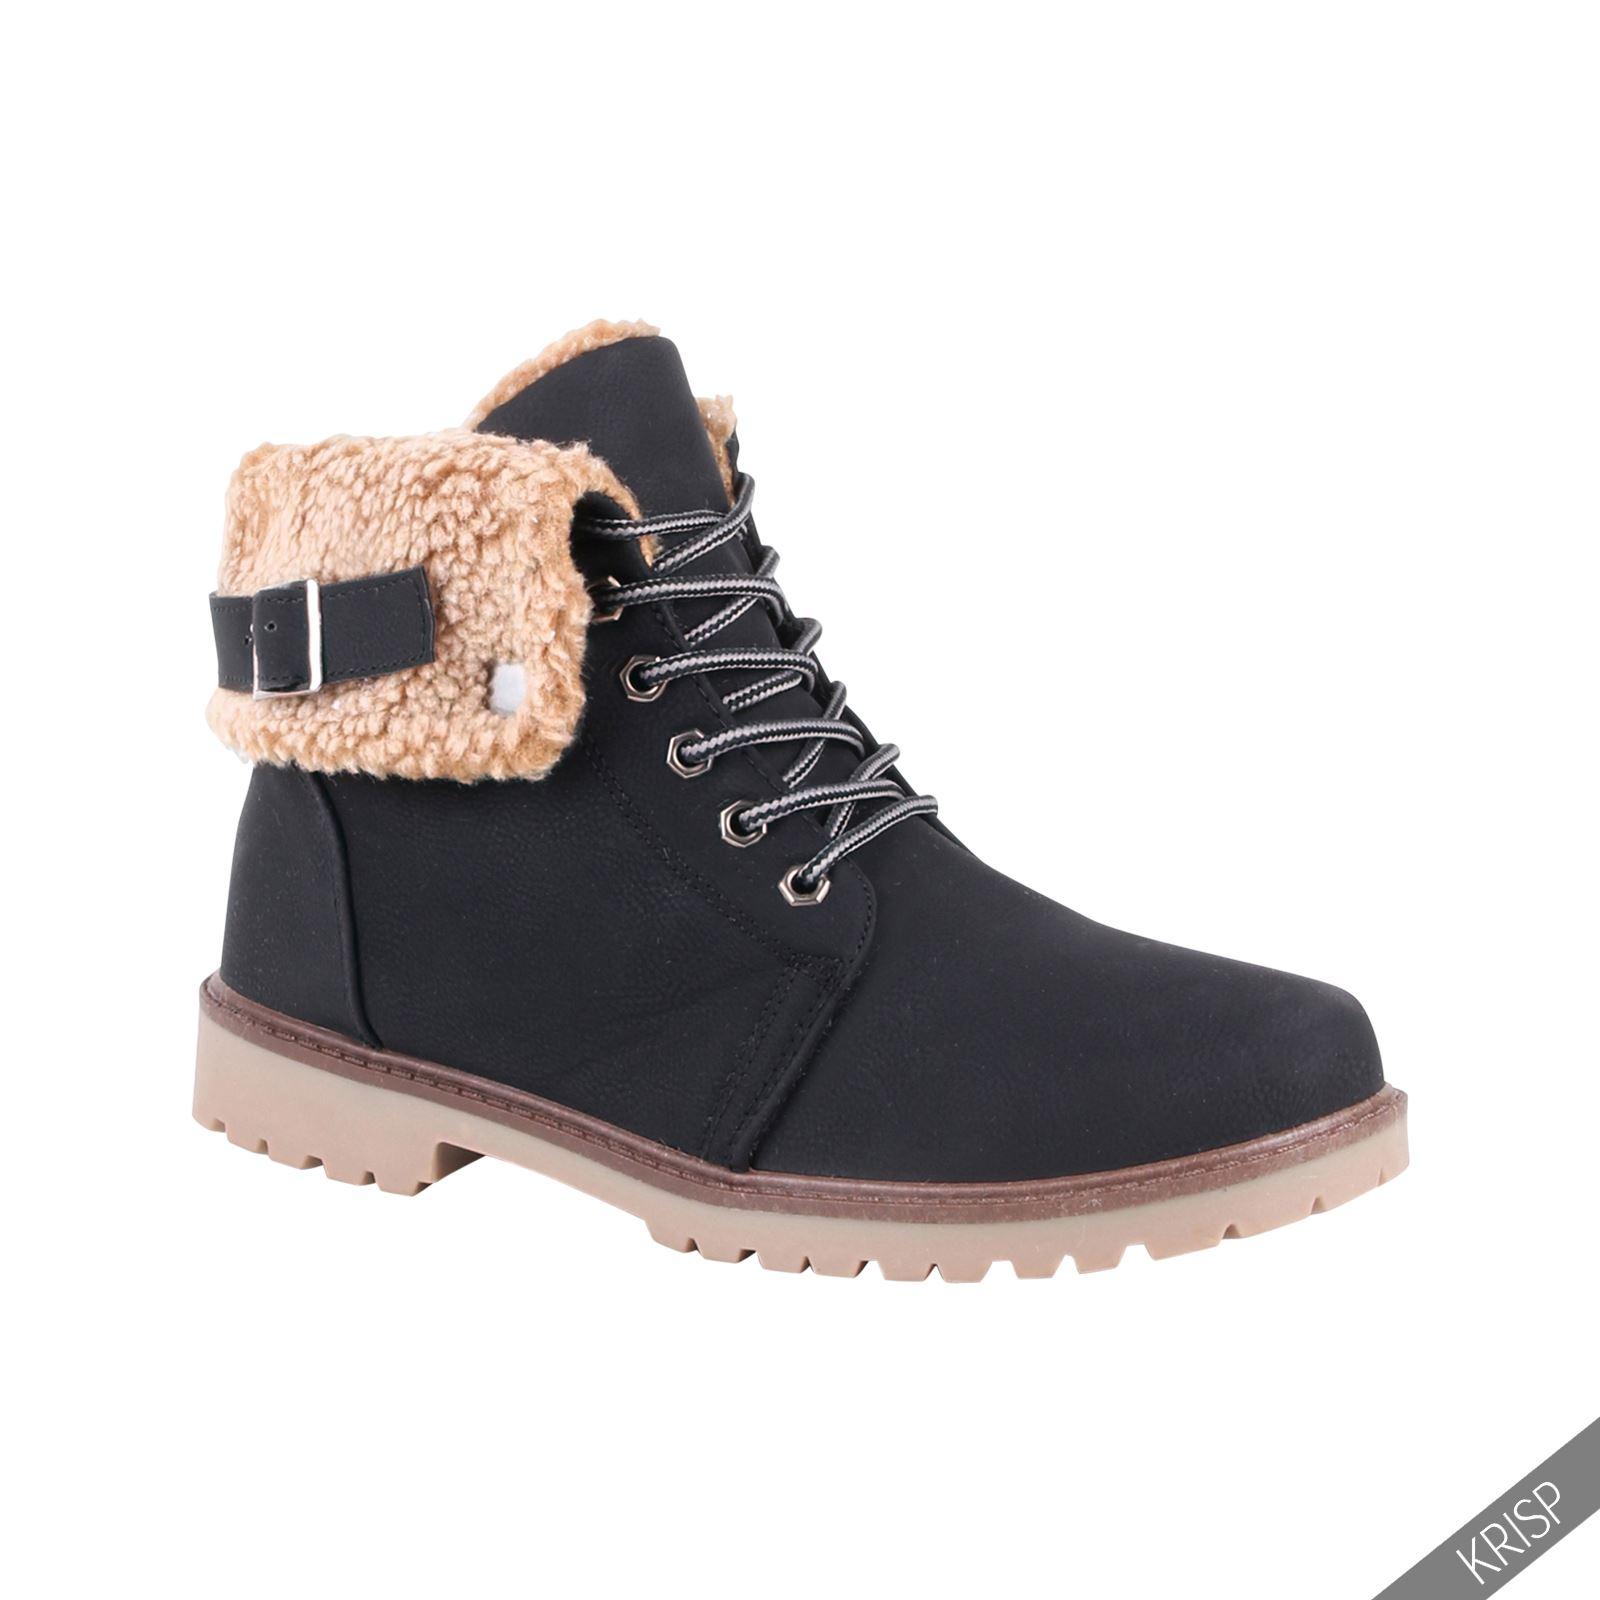 Botines-Mujer-Camel-Bota-Plana-Suela-Goma-Cordones-Casual-Otono-Invierno-Tacon miniatura 55